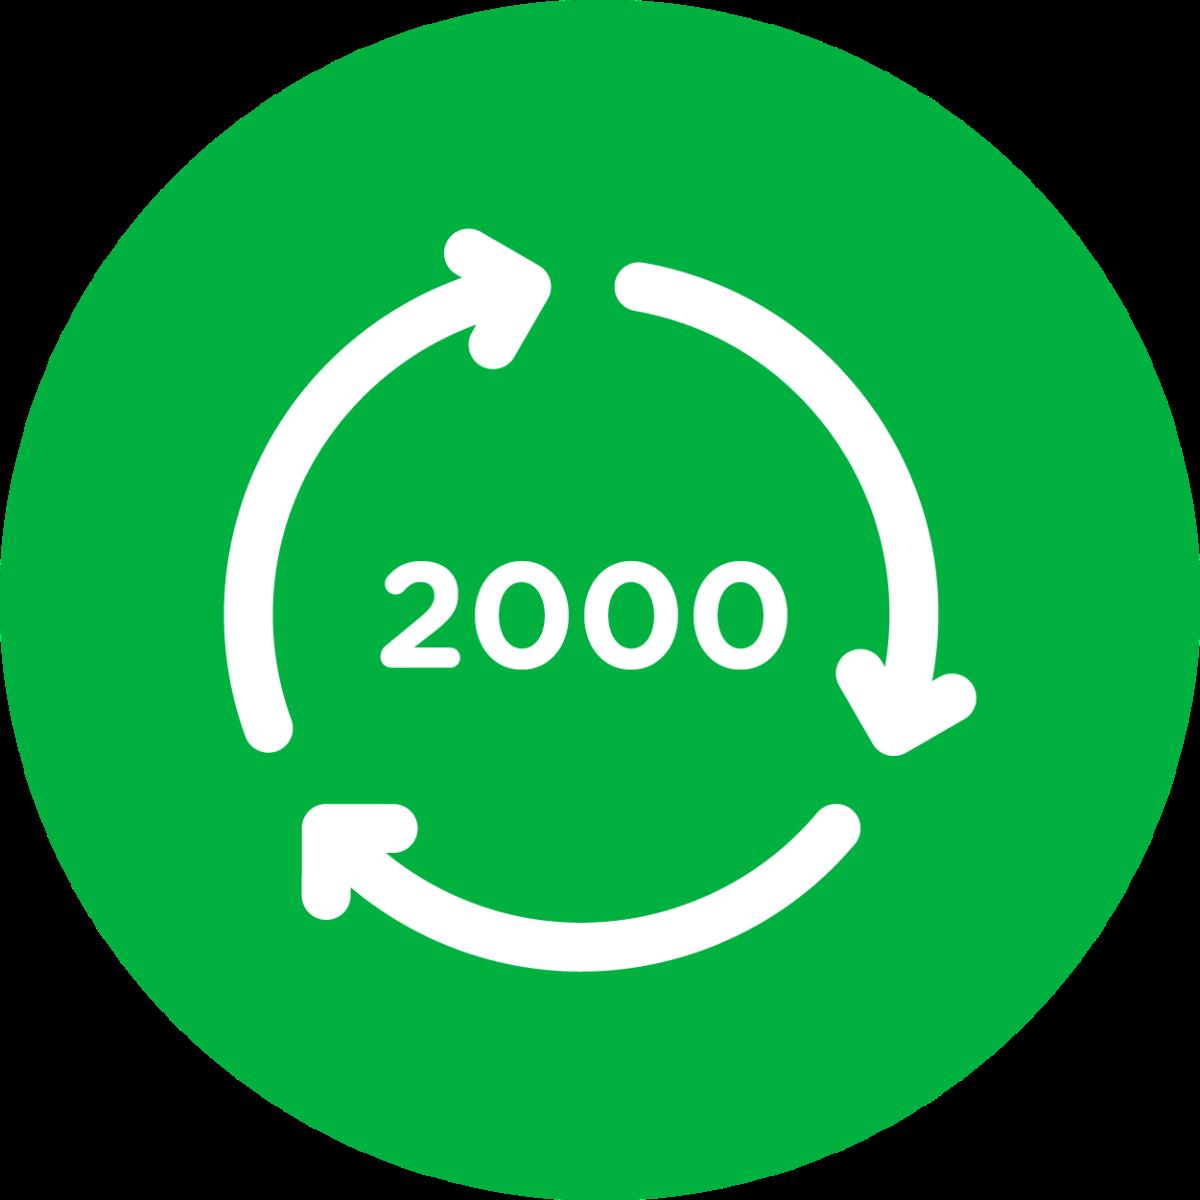 Reusable Over 2,000 Times